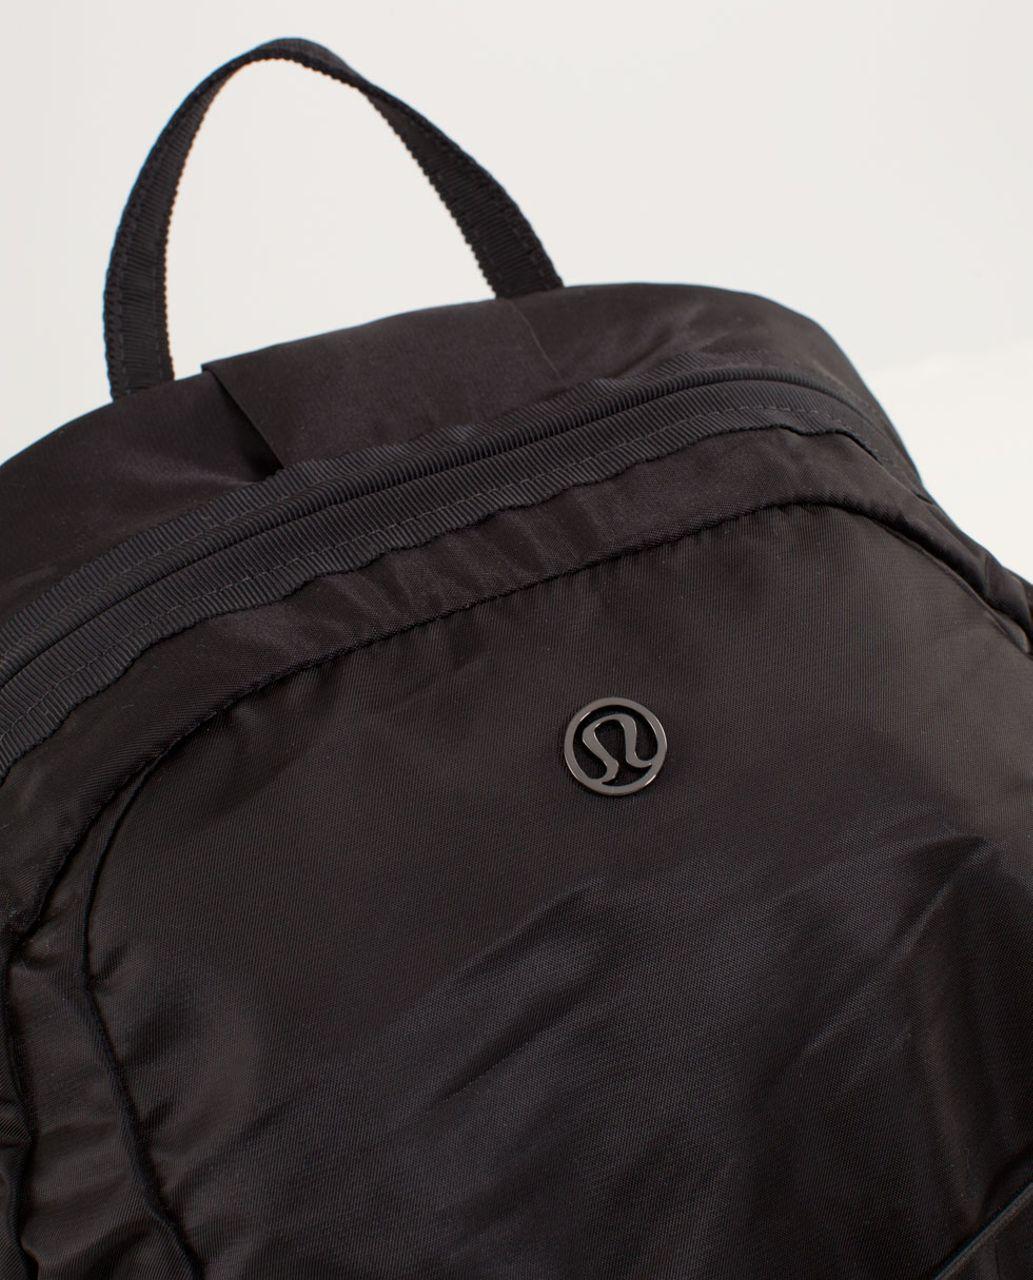 Lululemon Run From Work Backpack (First Release) - Black